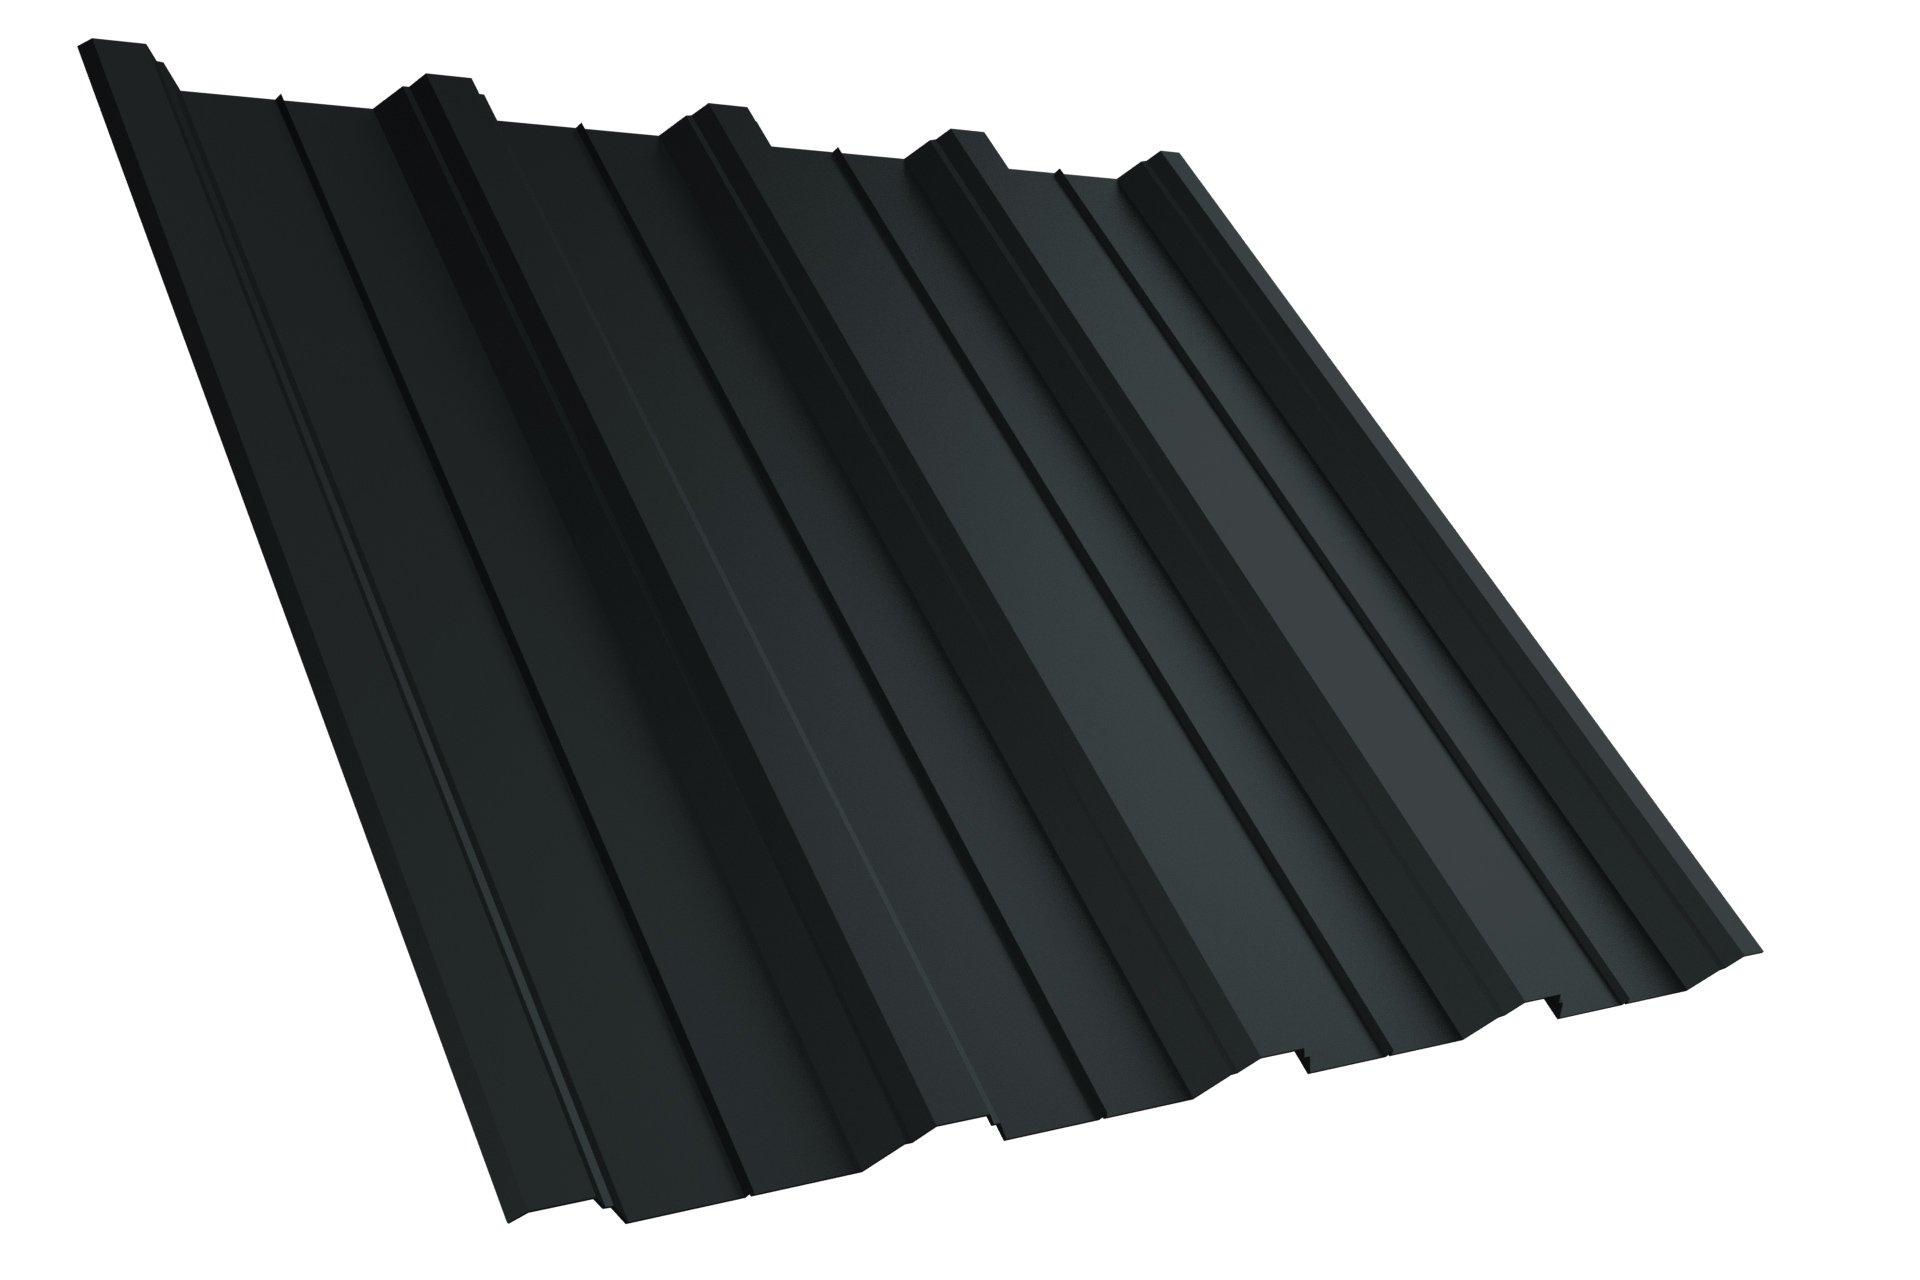 Dachplatte T40 RAL7016